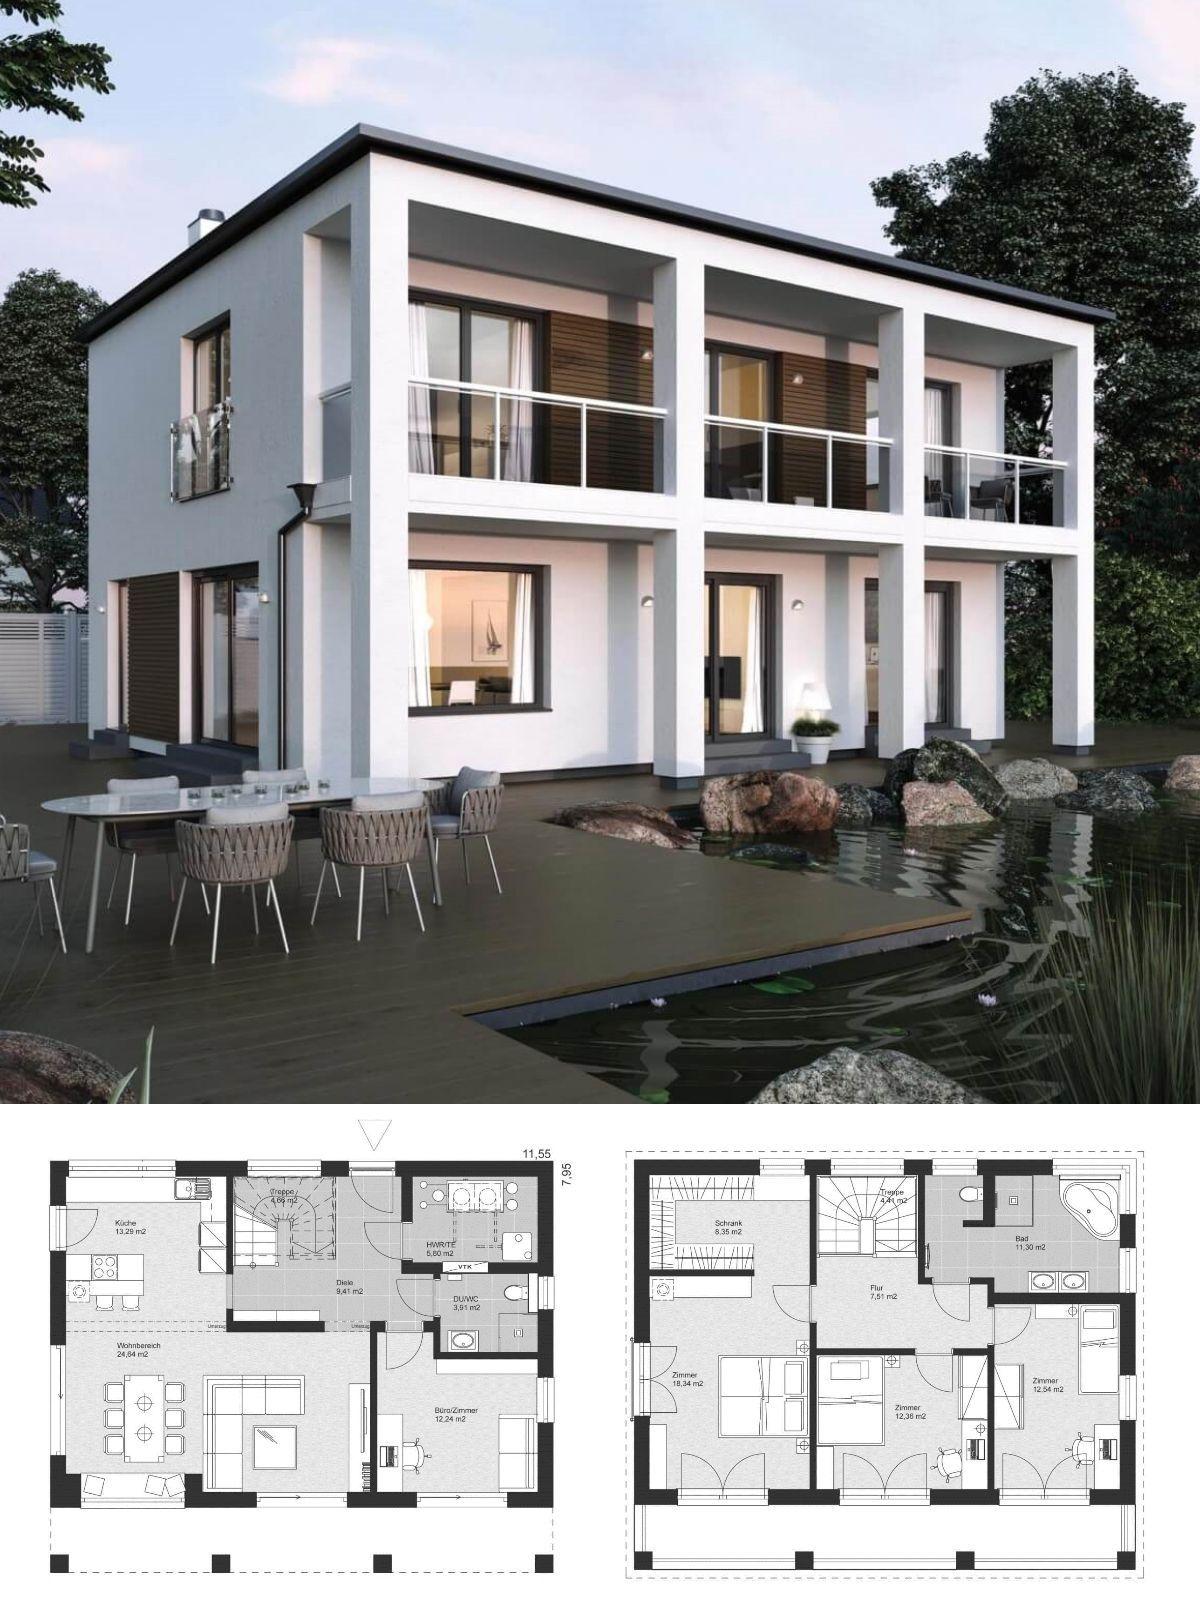 Bauhaus stadtvilla modern grundriss mit flachdach for Grundriss einfamilienhaus 2 vollgeschosse